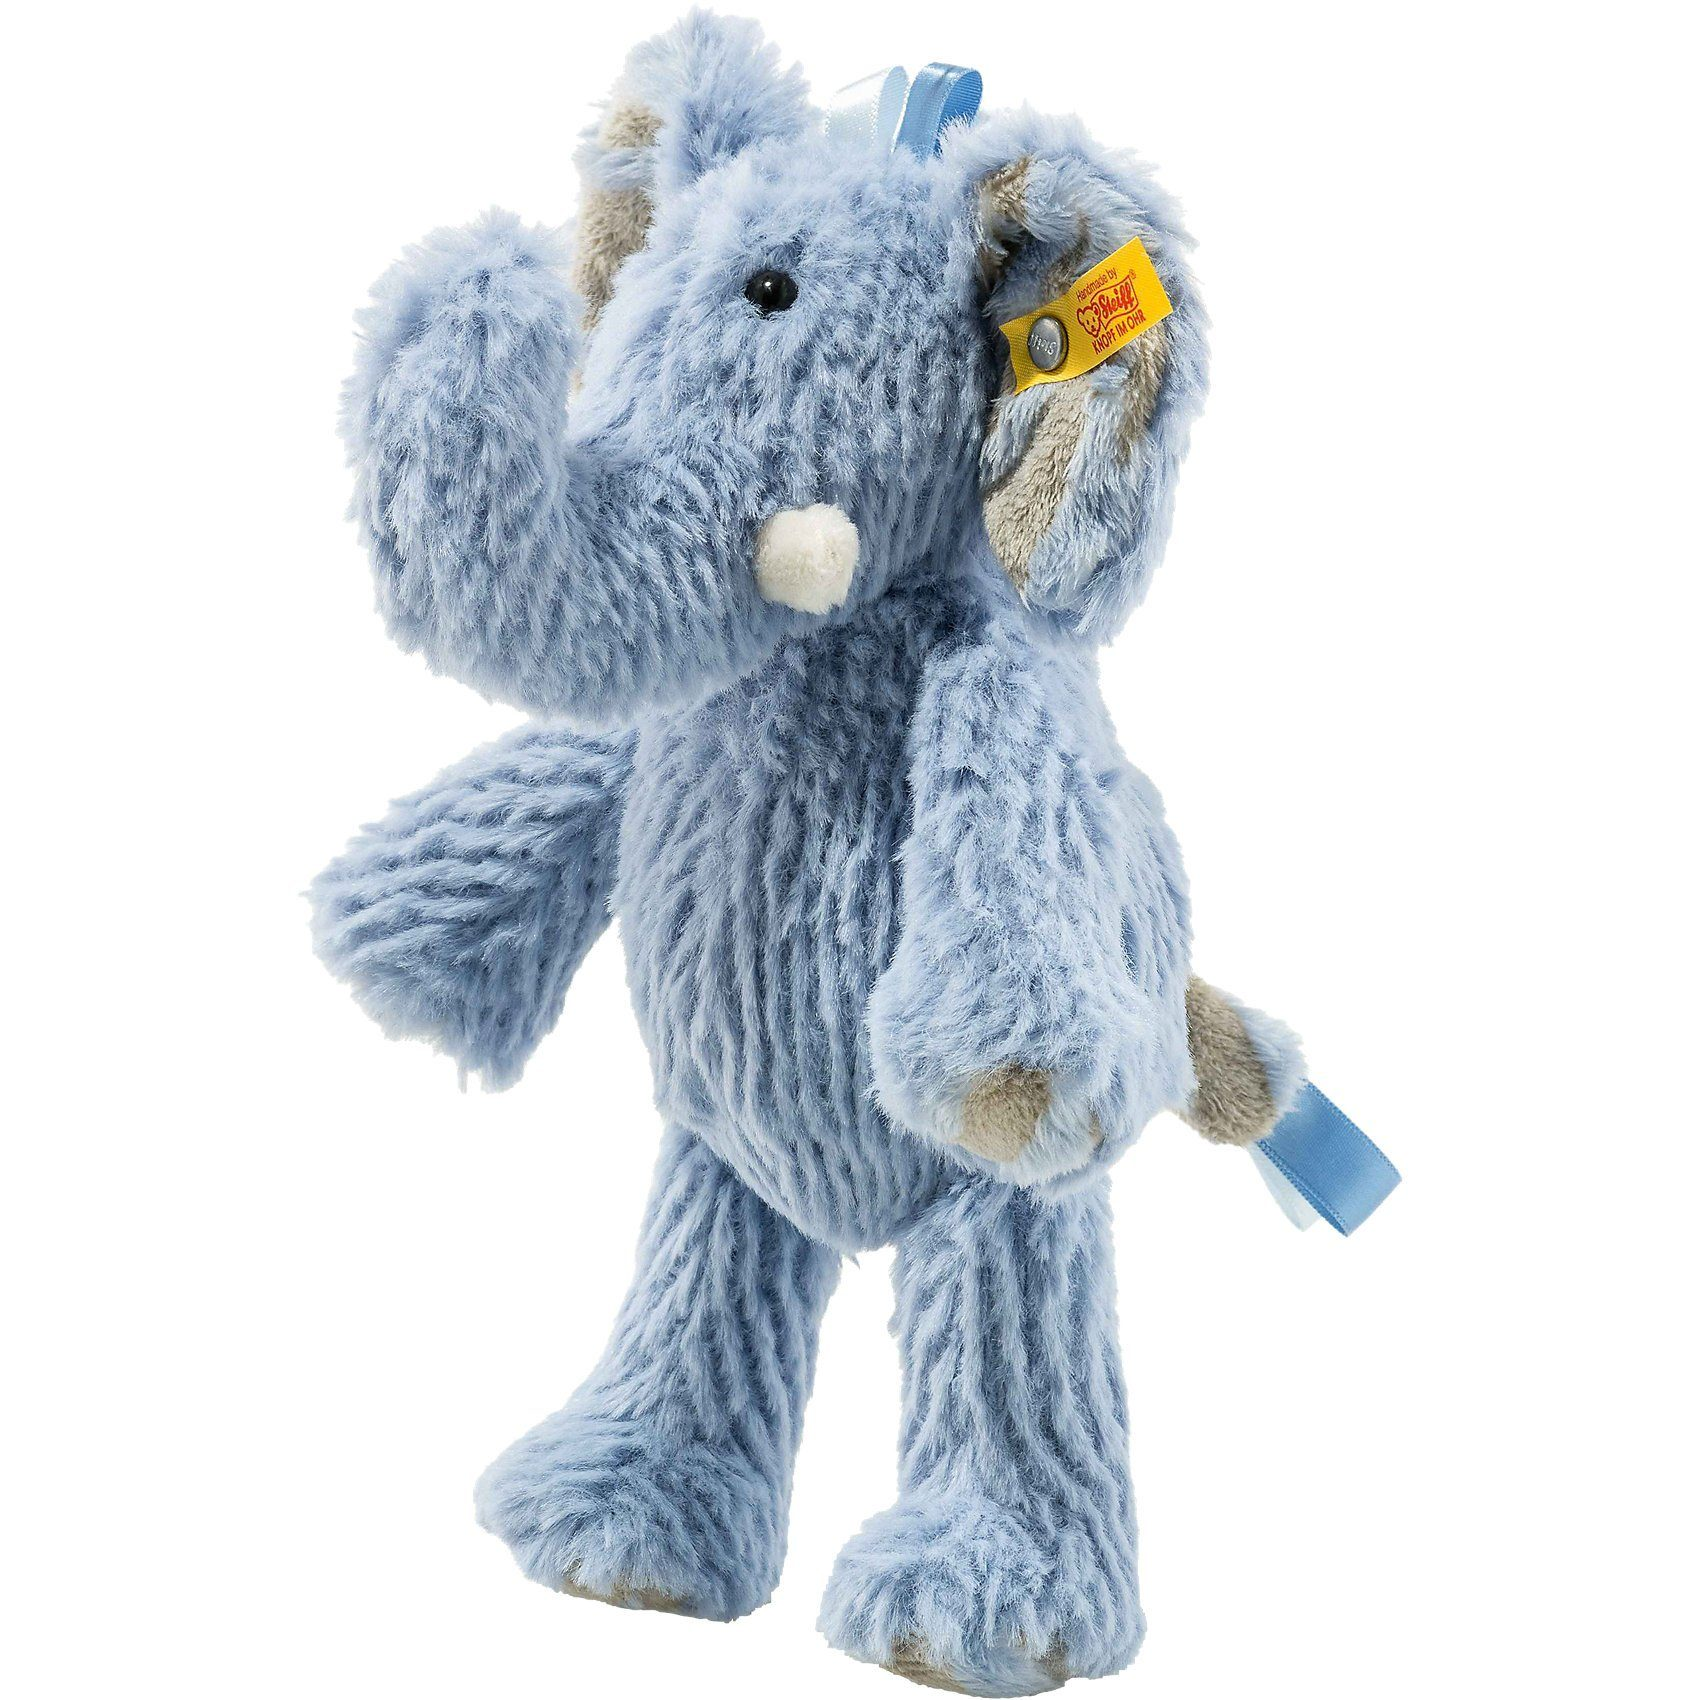 Steiff Elefant Earz blau, 20 cm